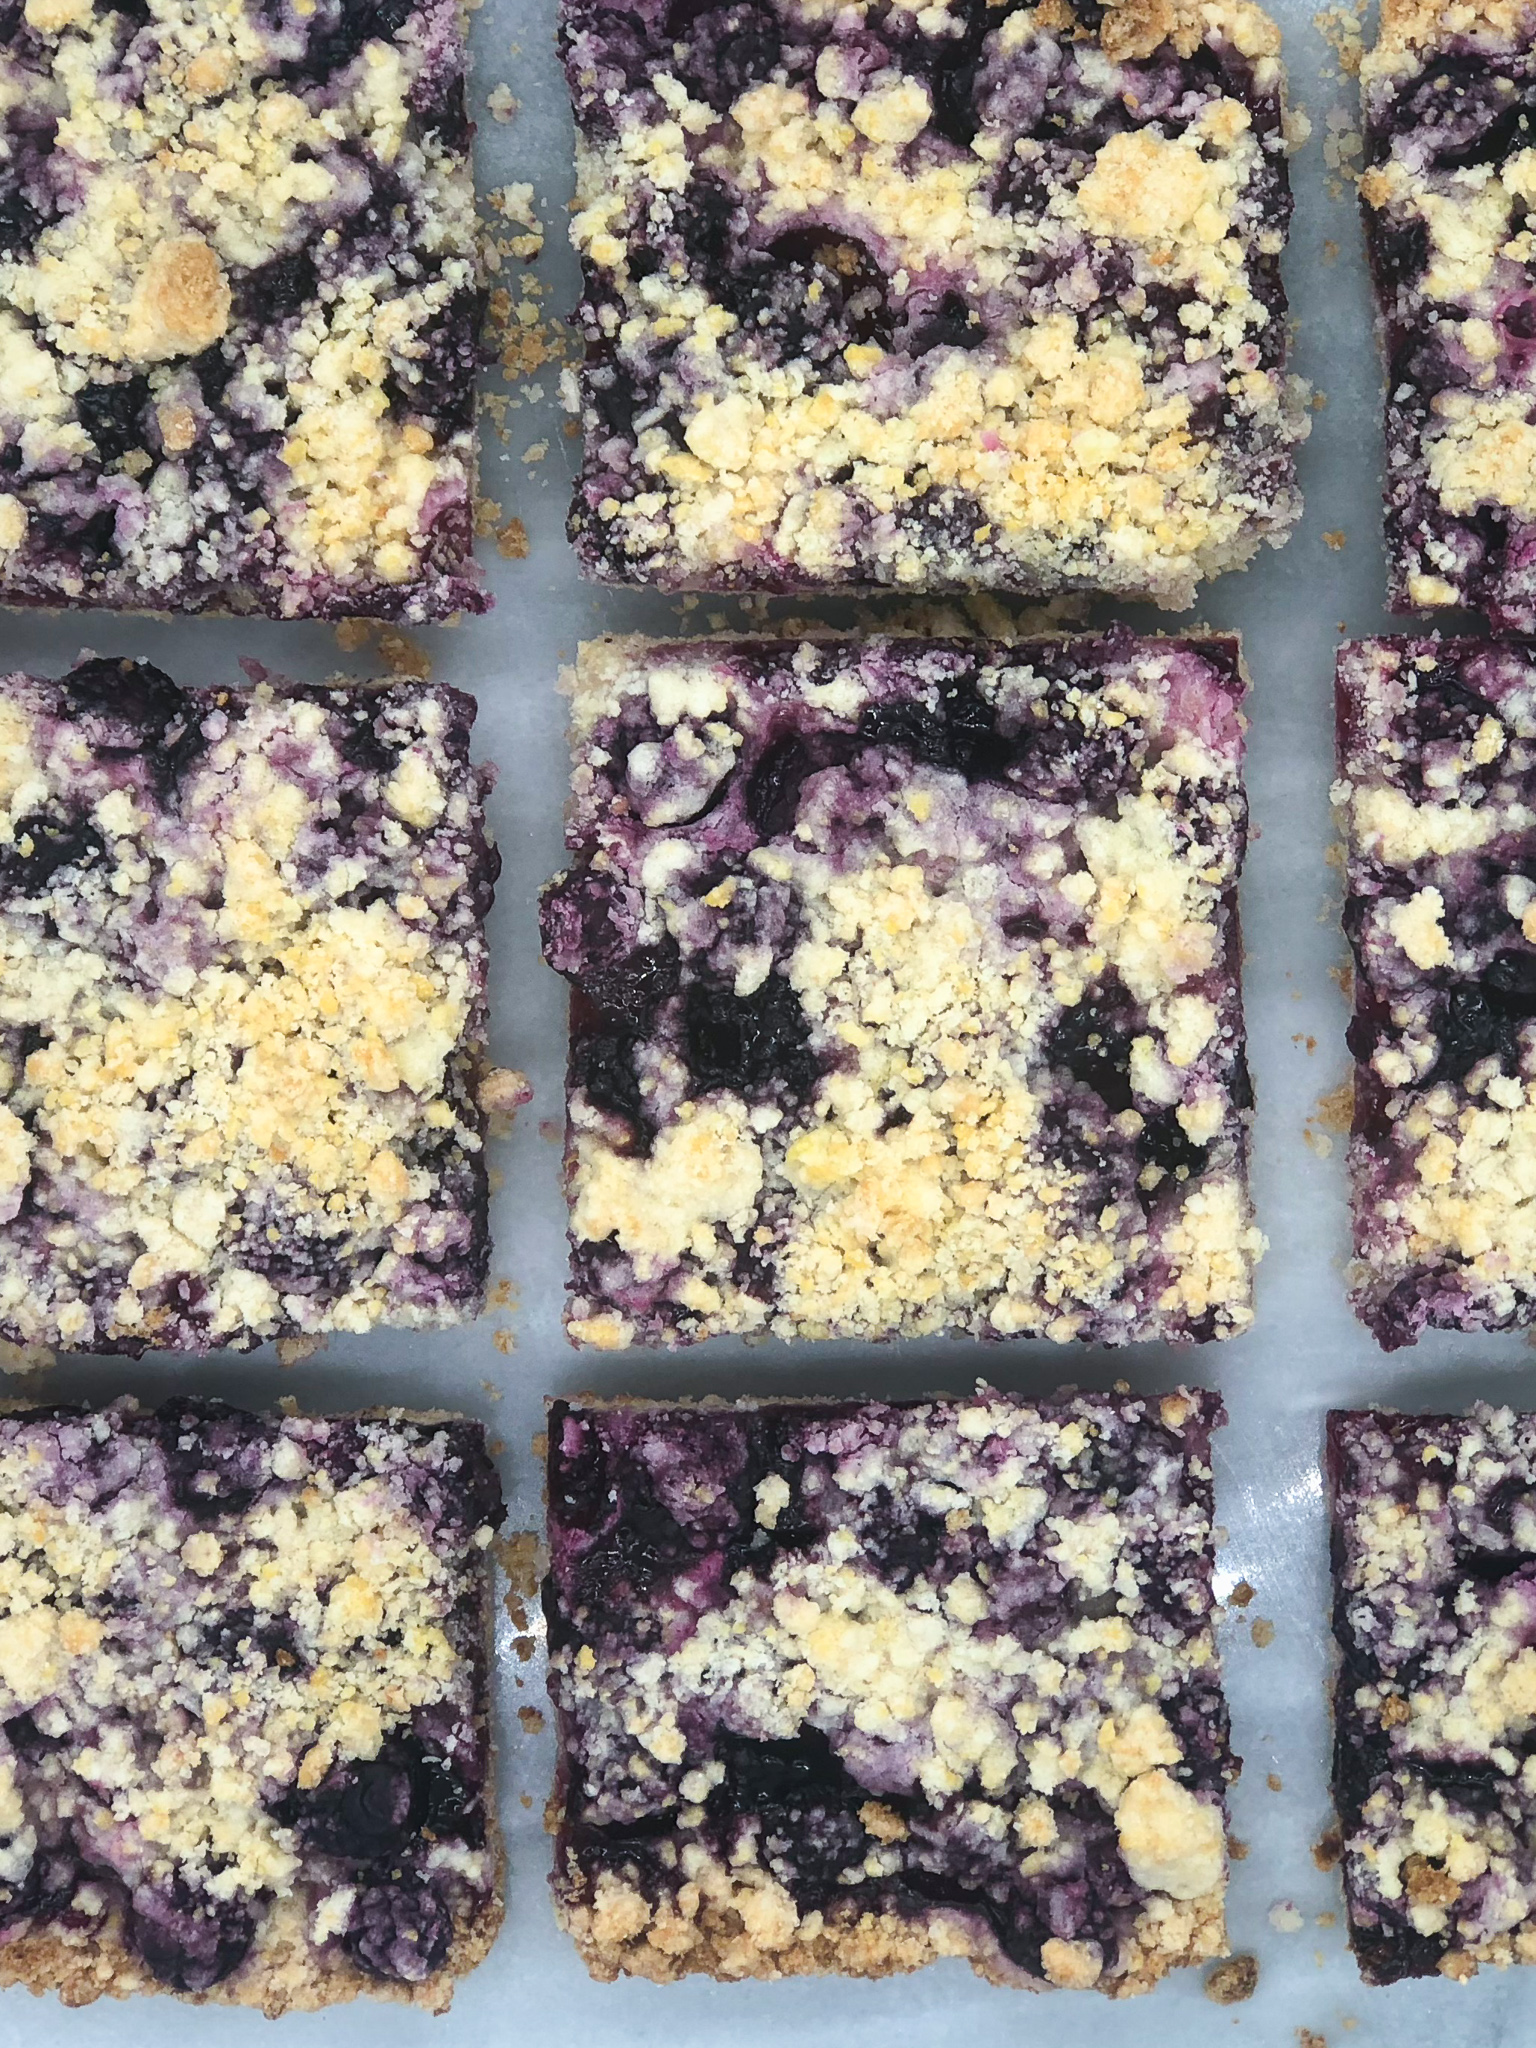 Gluten-free blueberry crumb bars.